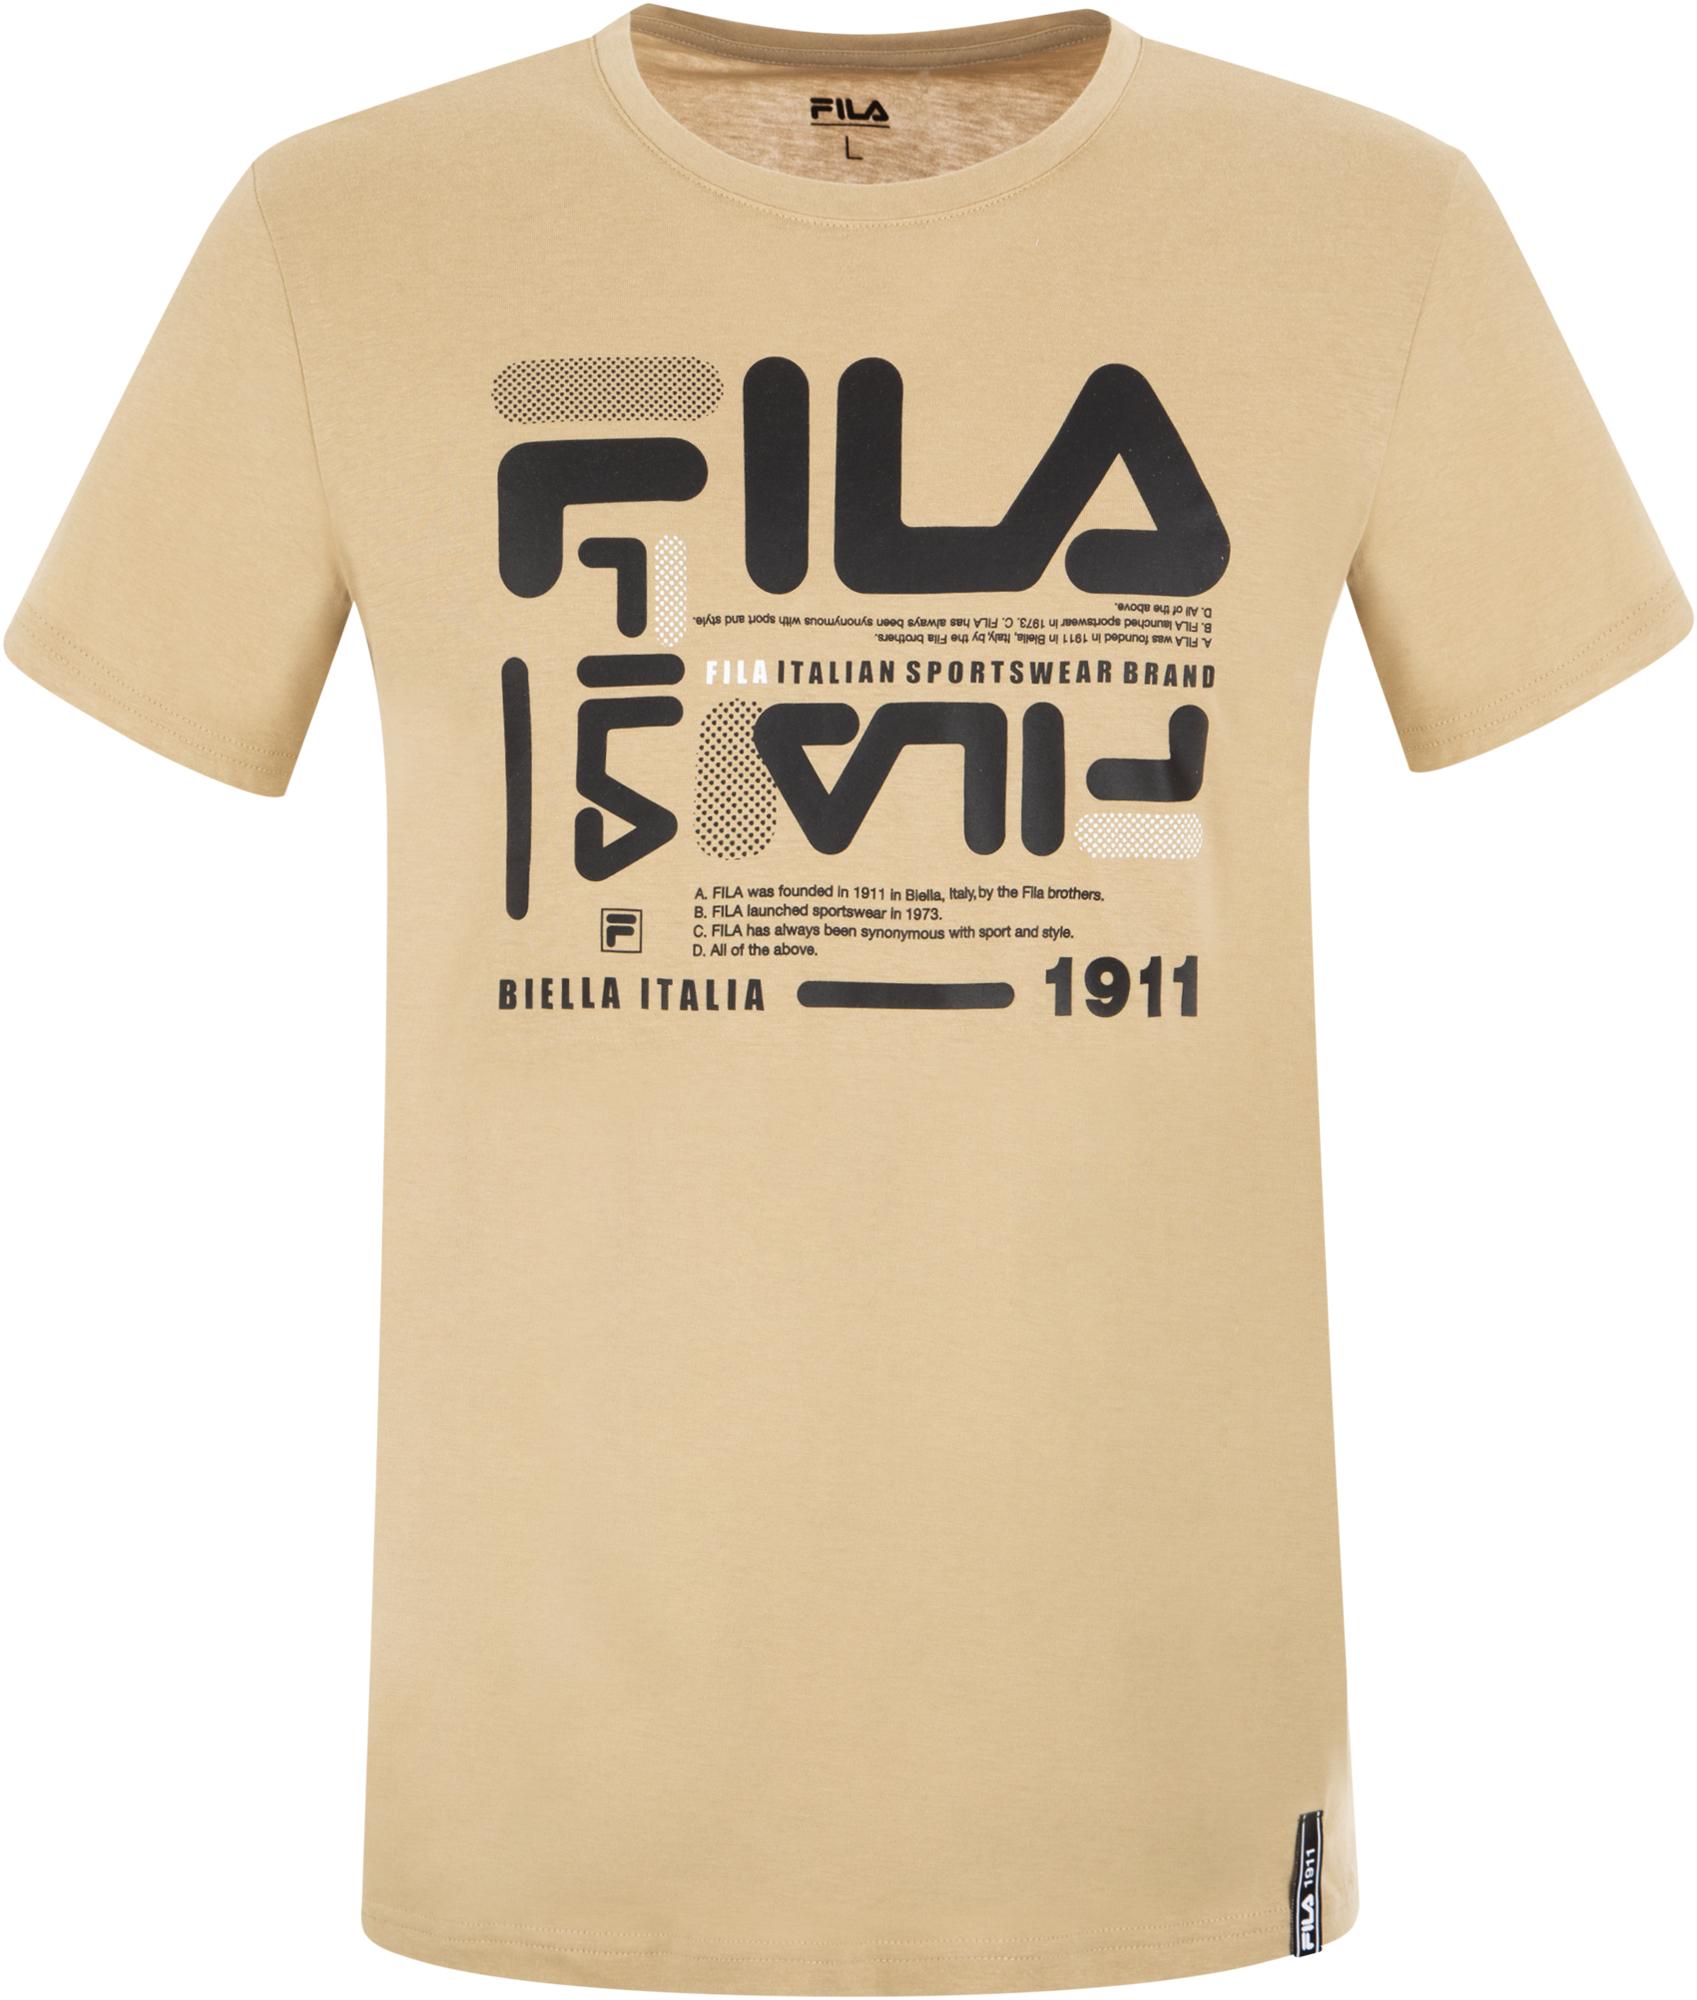 Fila Футболка мужская Fila, размер 54